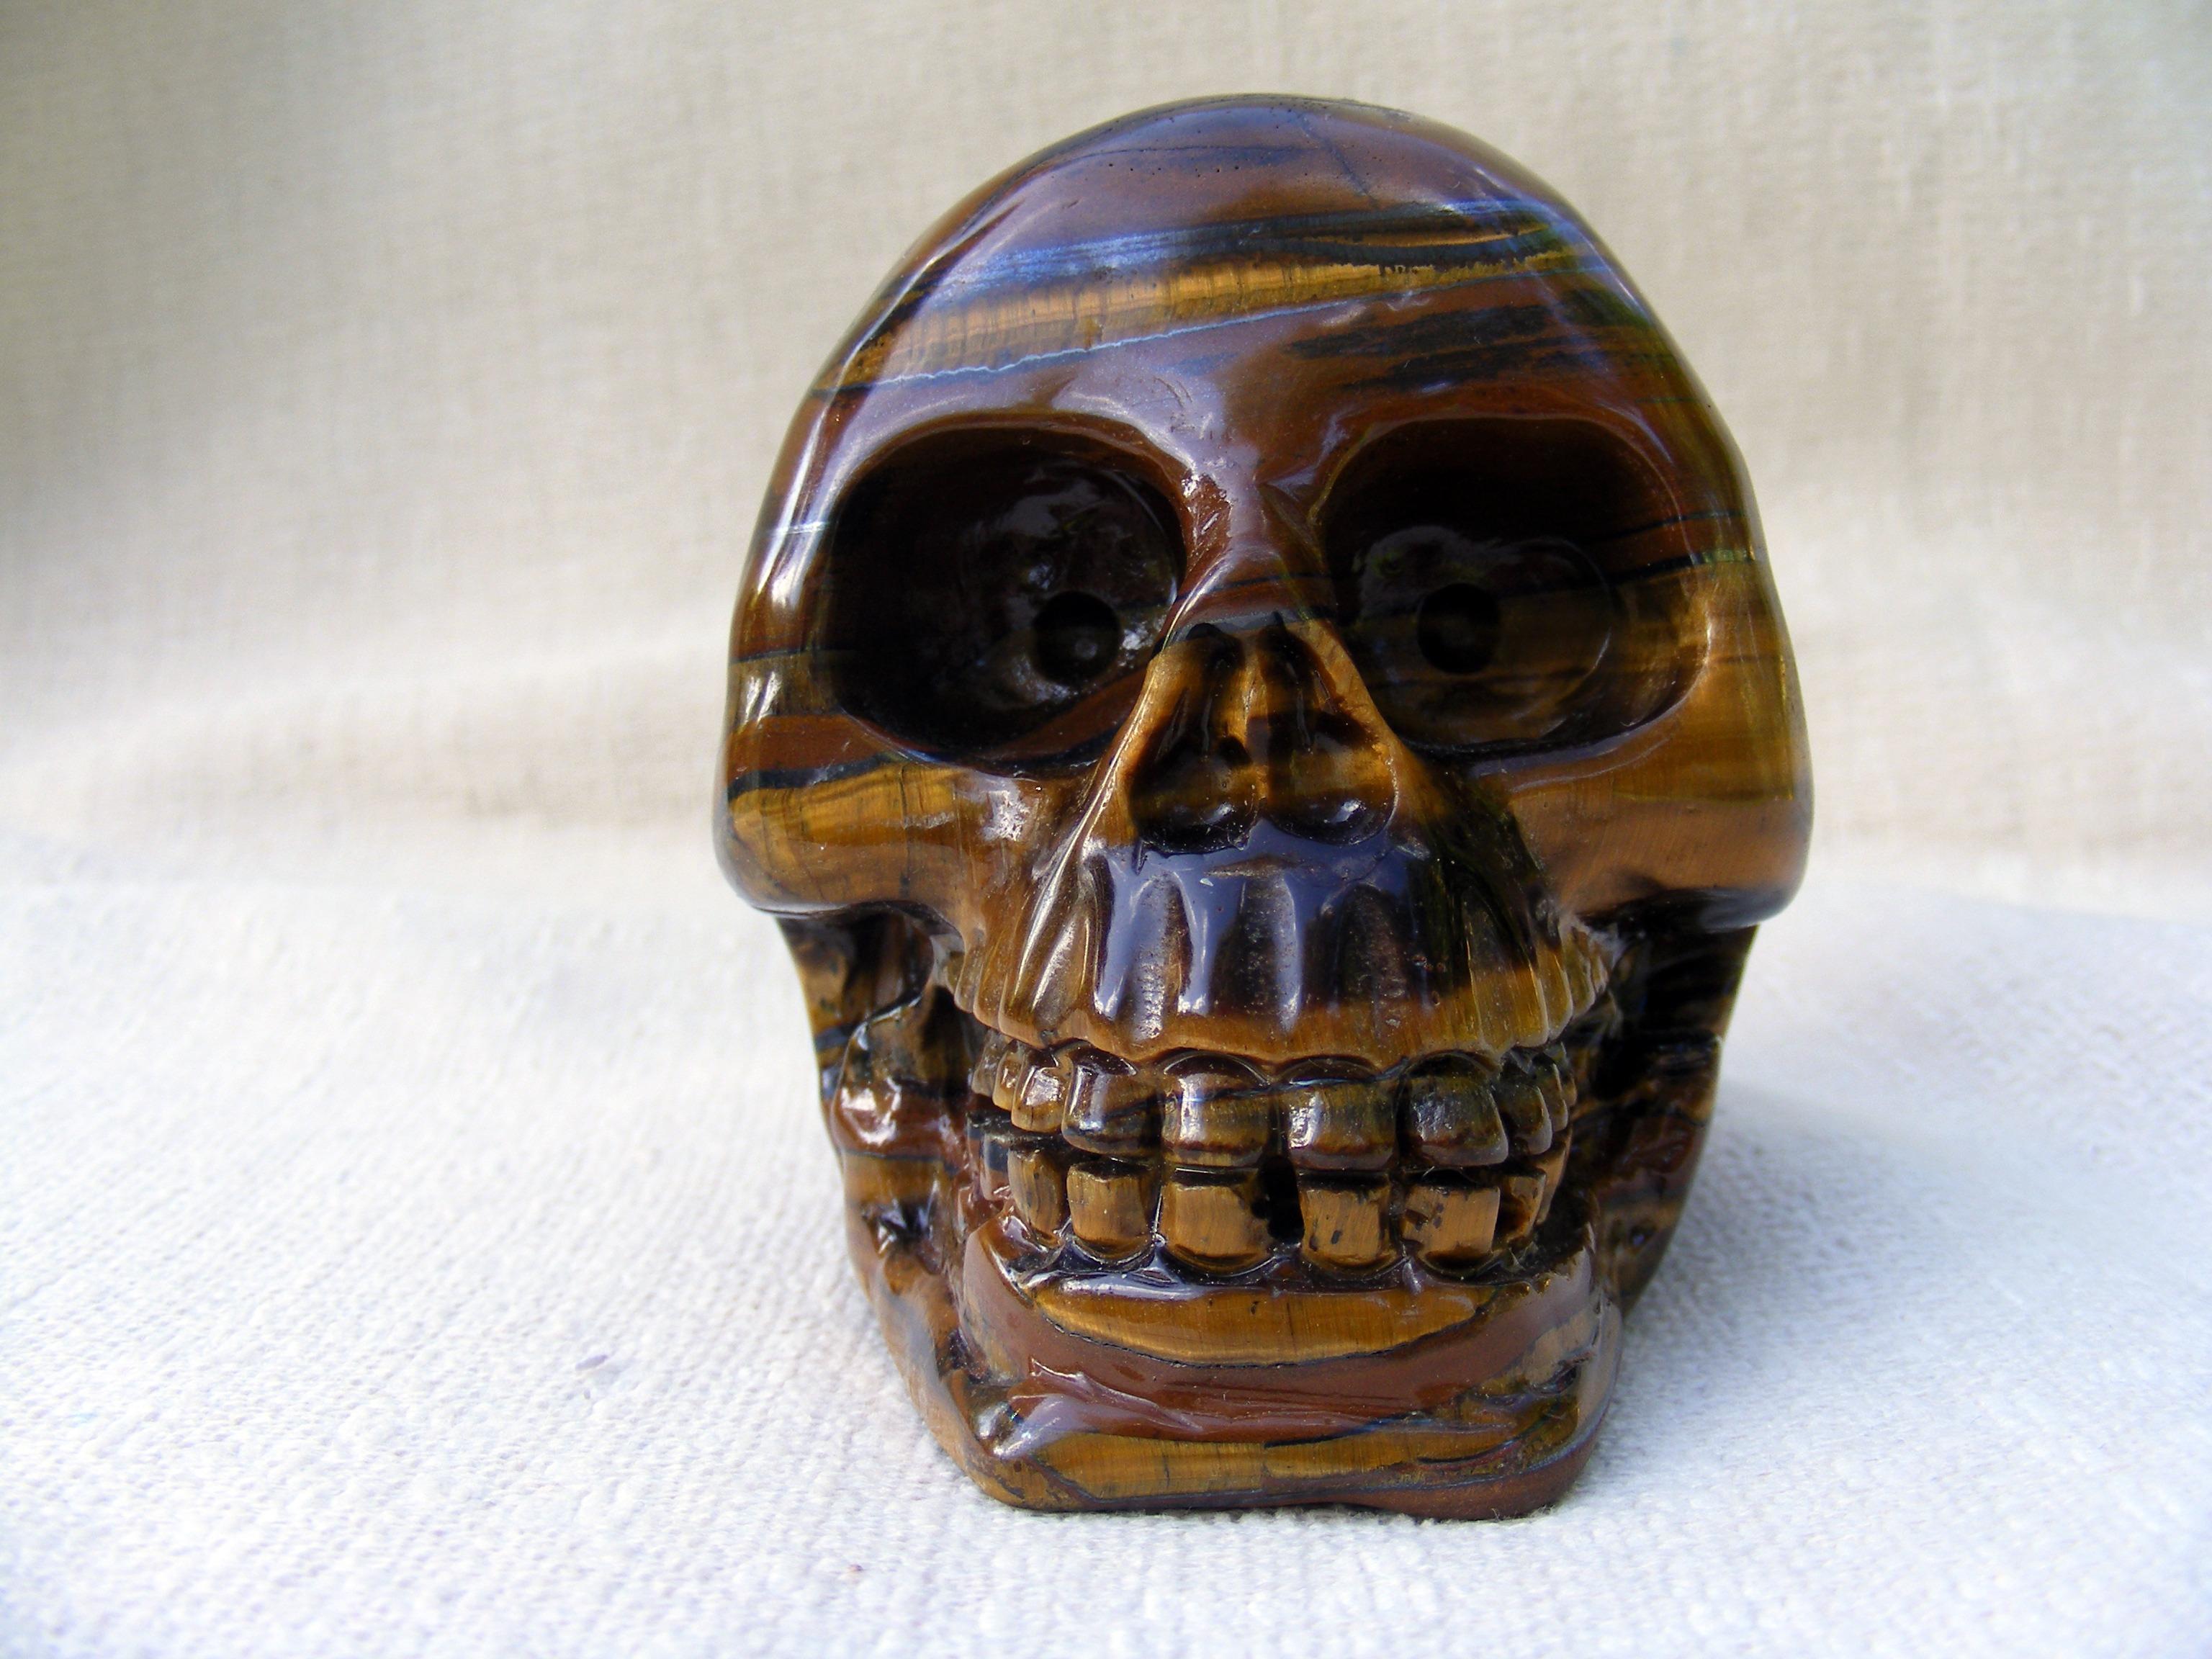 Free Images : hand, dead, death, skull, bone, sculpture, head ...